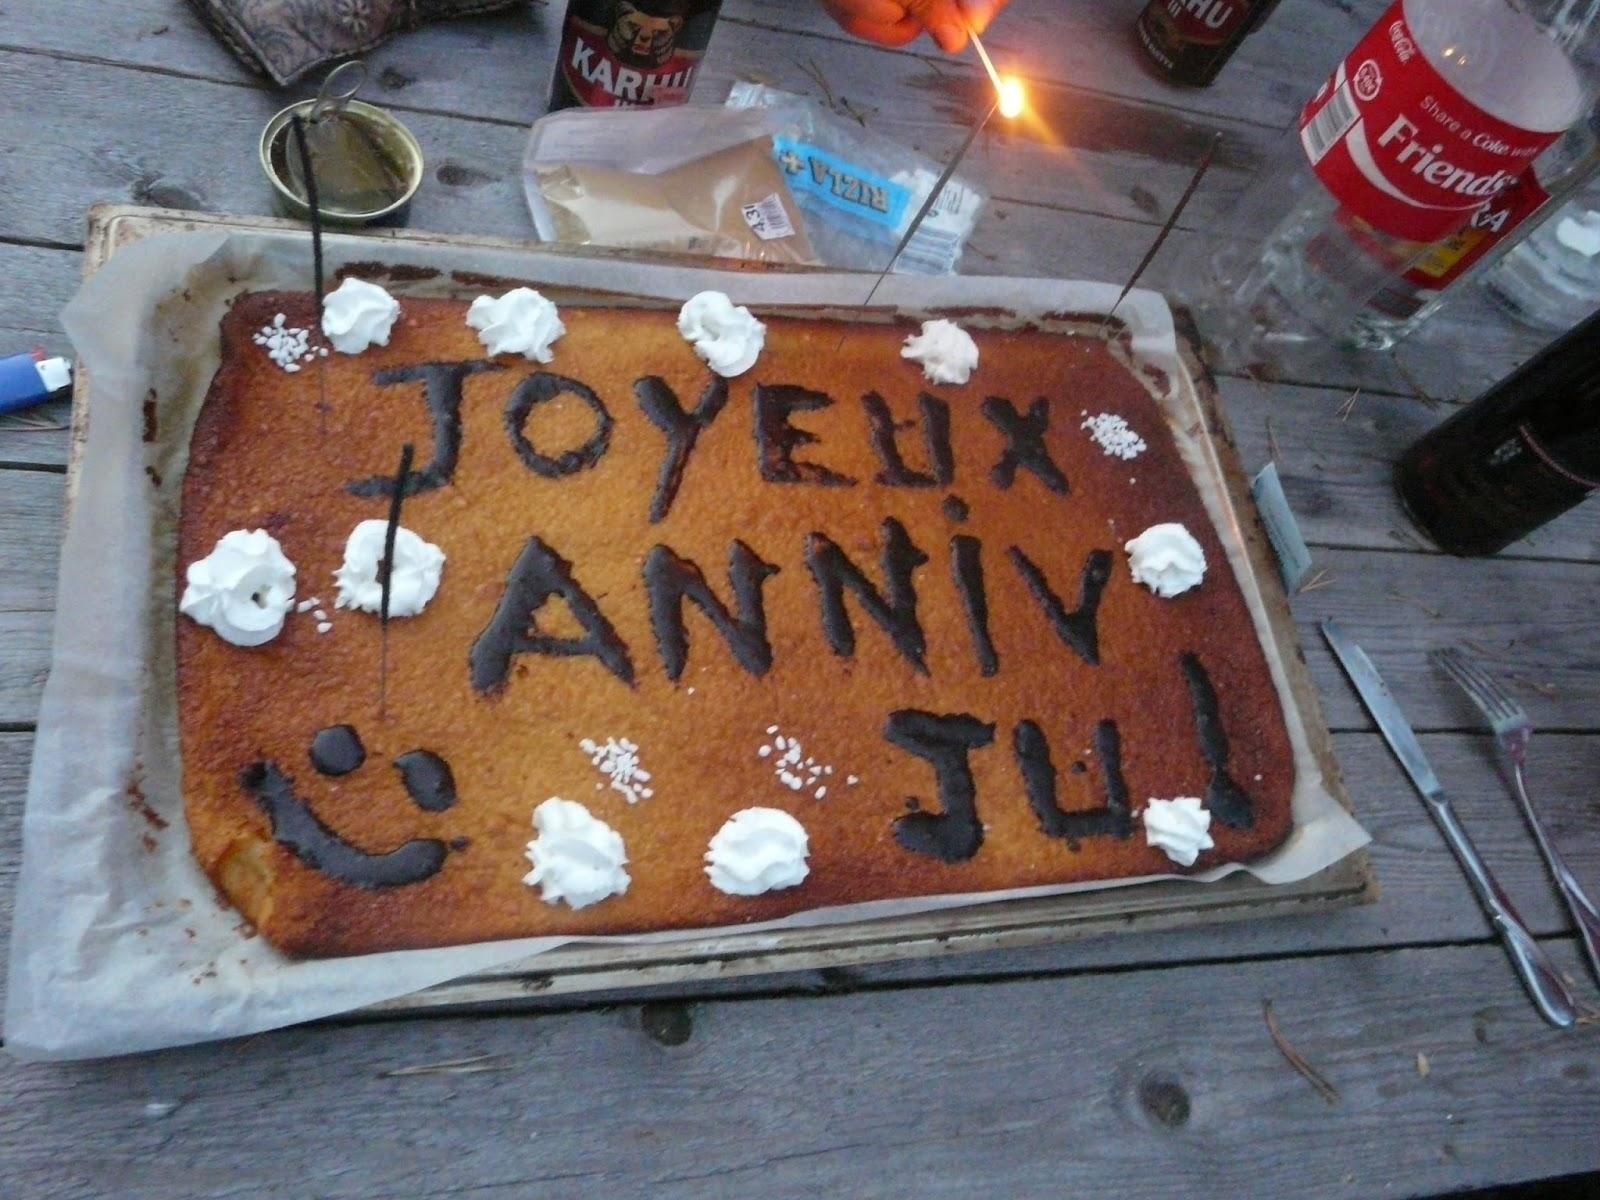 Tervetuloa Suomi Joyeux Anniversaire Julie